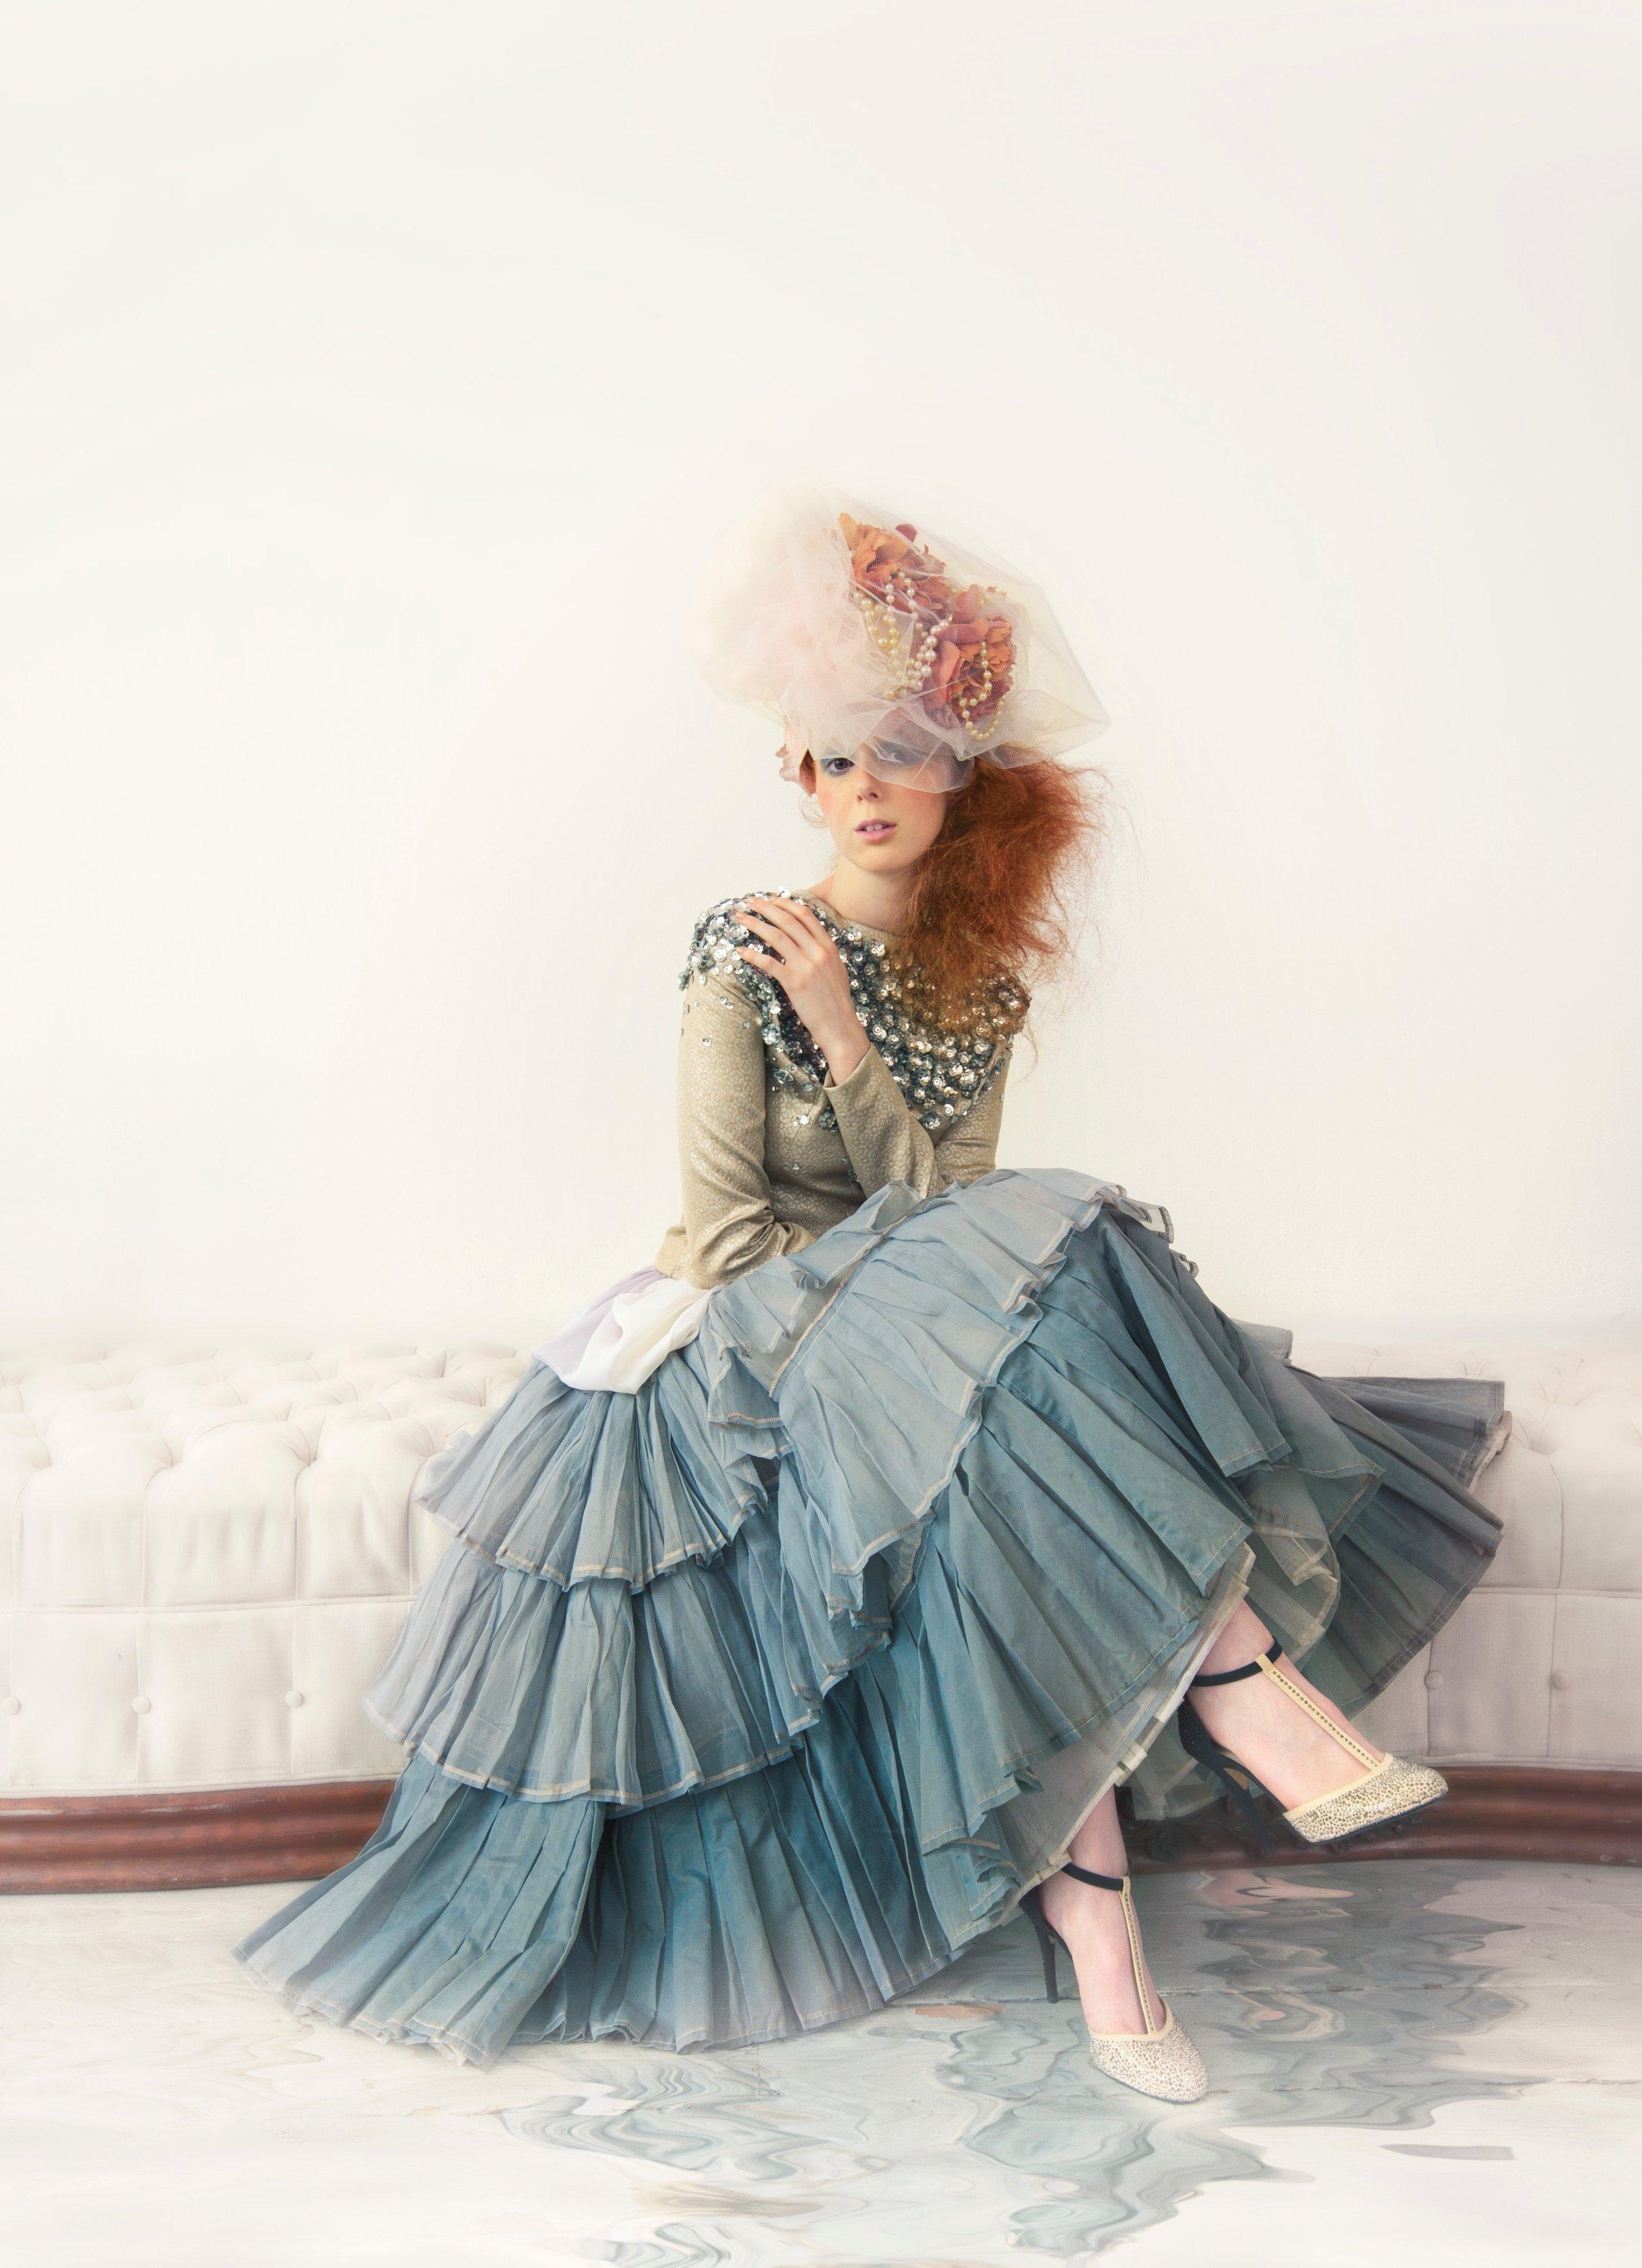 Tulle, rose & pearl headpiece